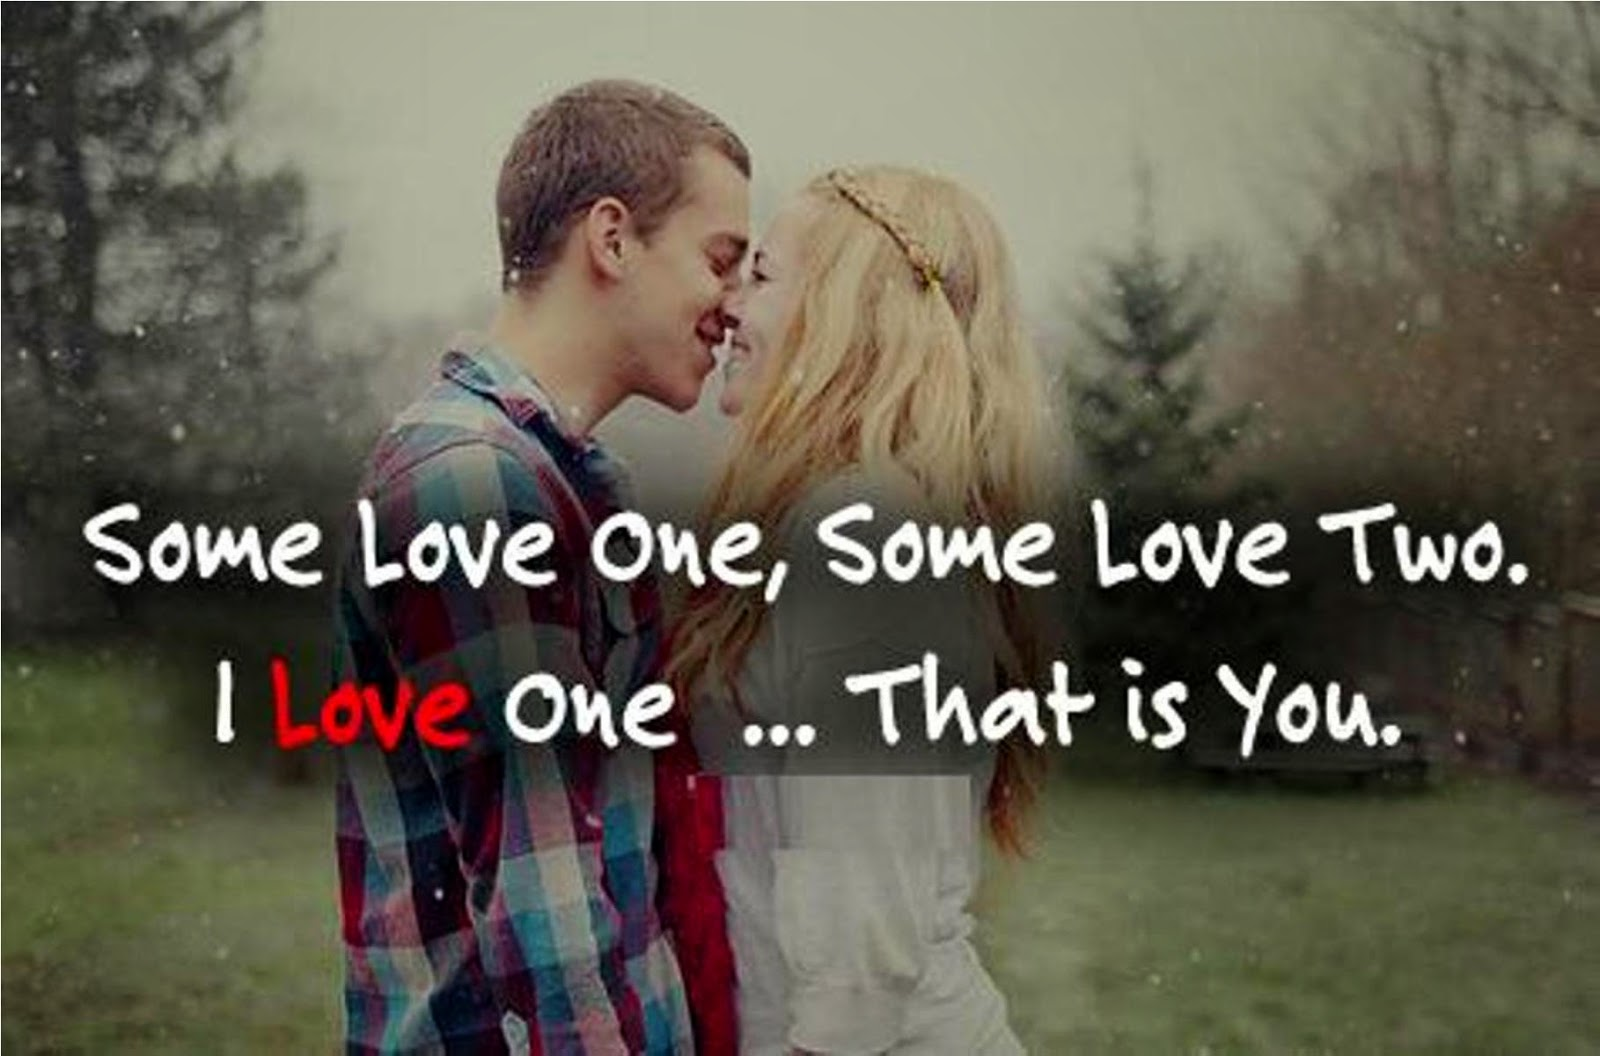 Romantic Love quotes - Relationship quotes whatsapp - Whatsapp Status ...